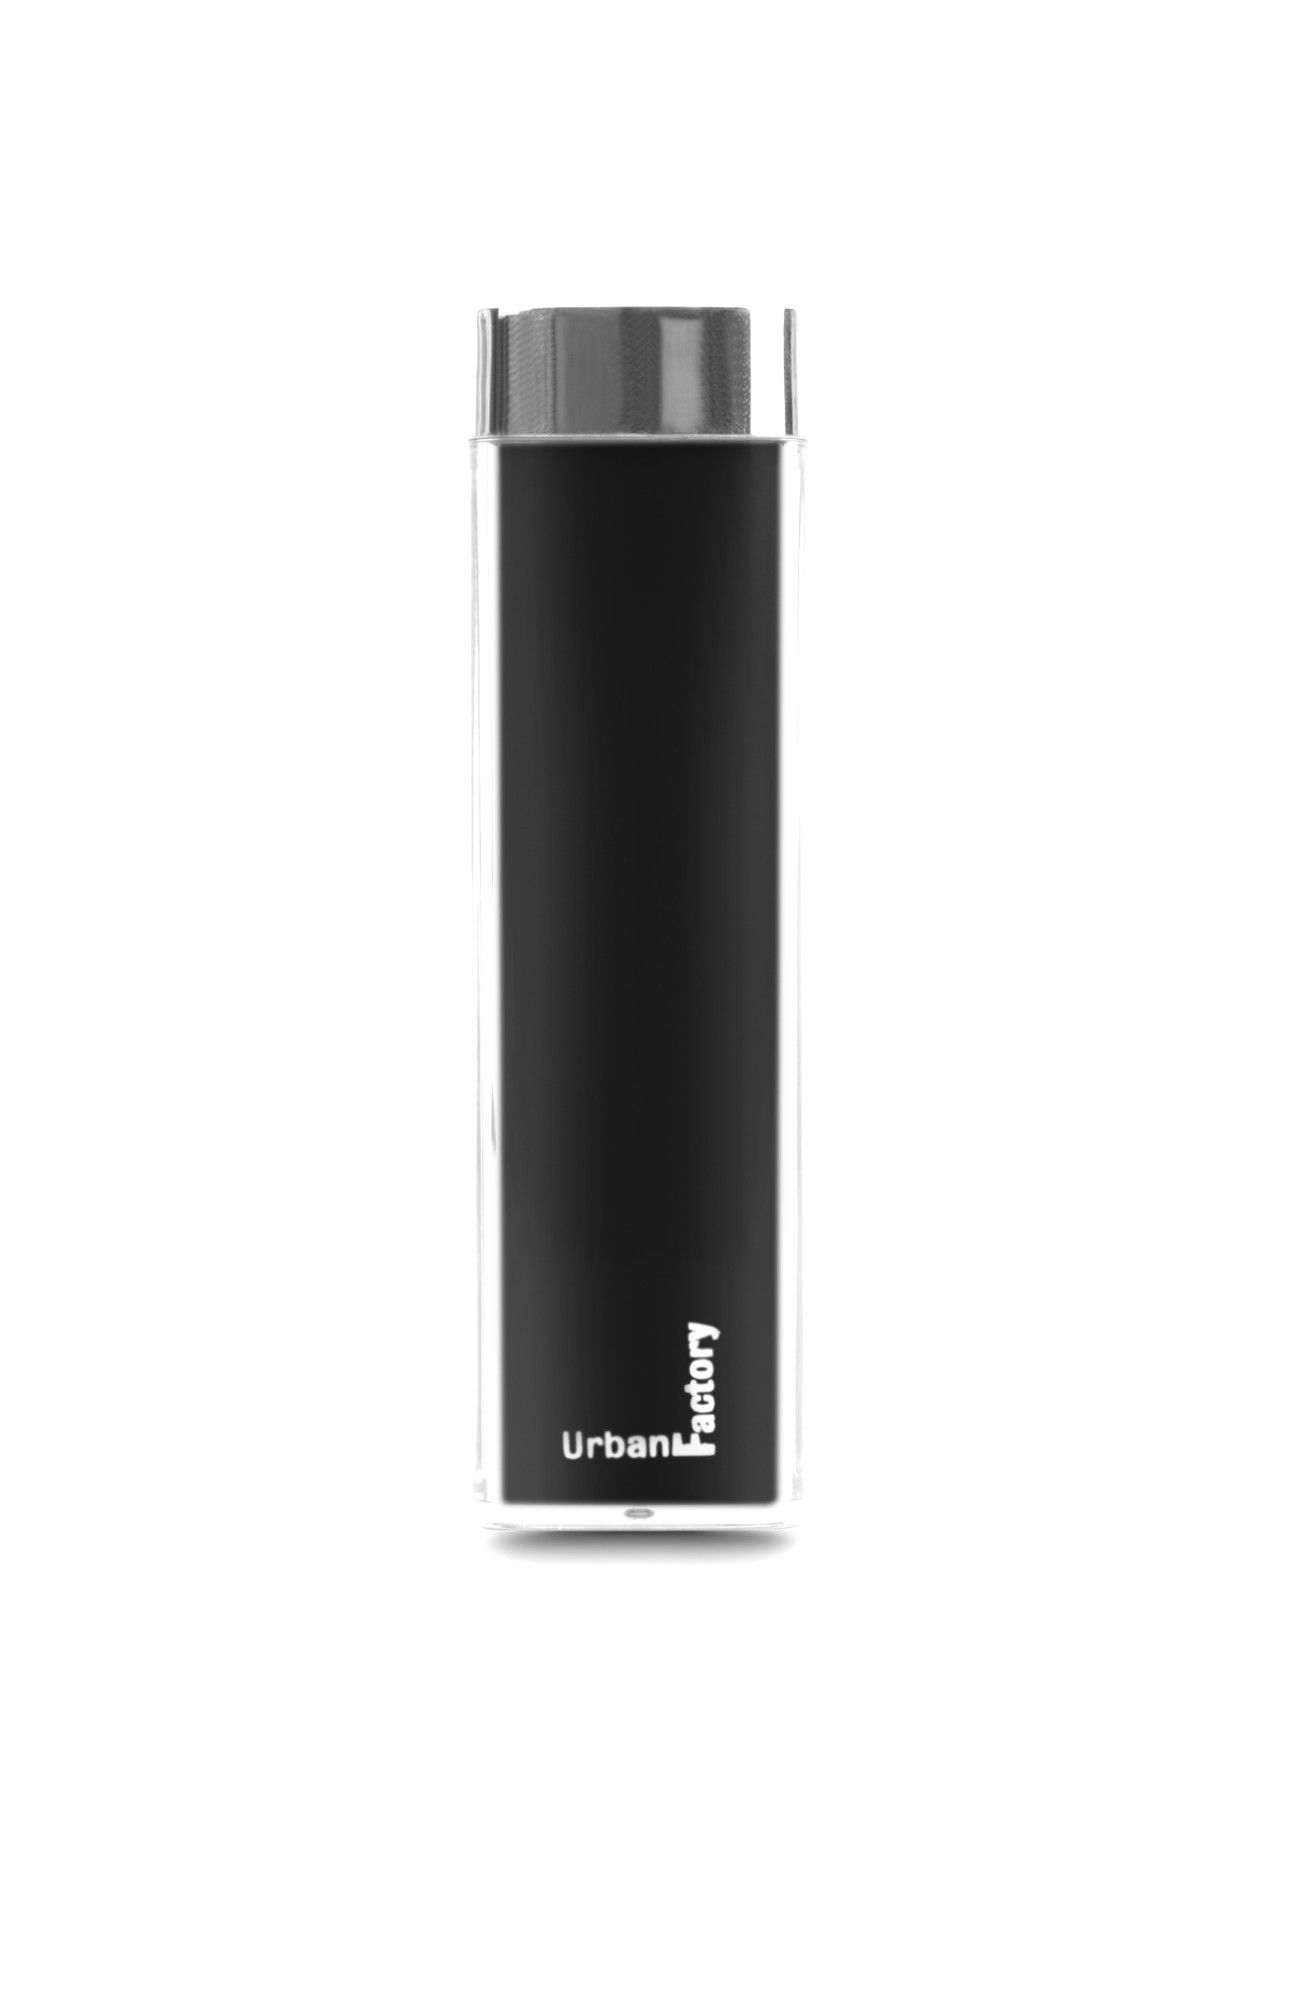 Urban Factory Lipstick batería externa Negro 2600 mAh